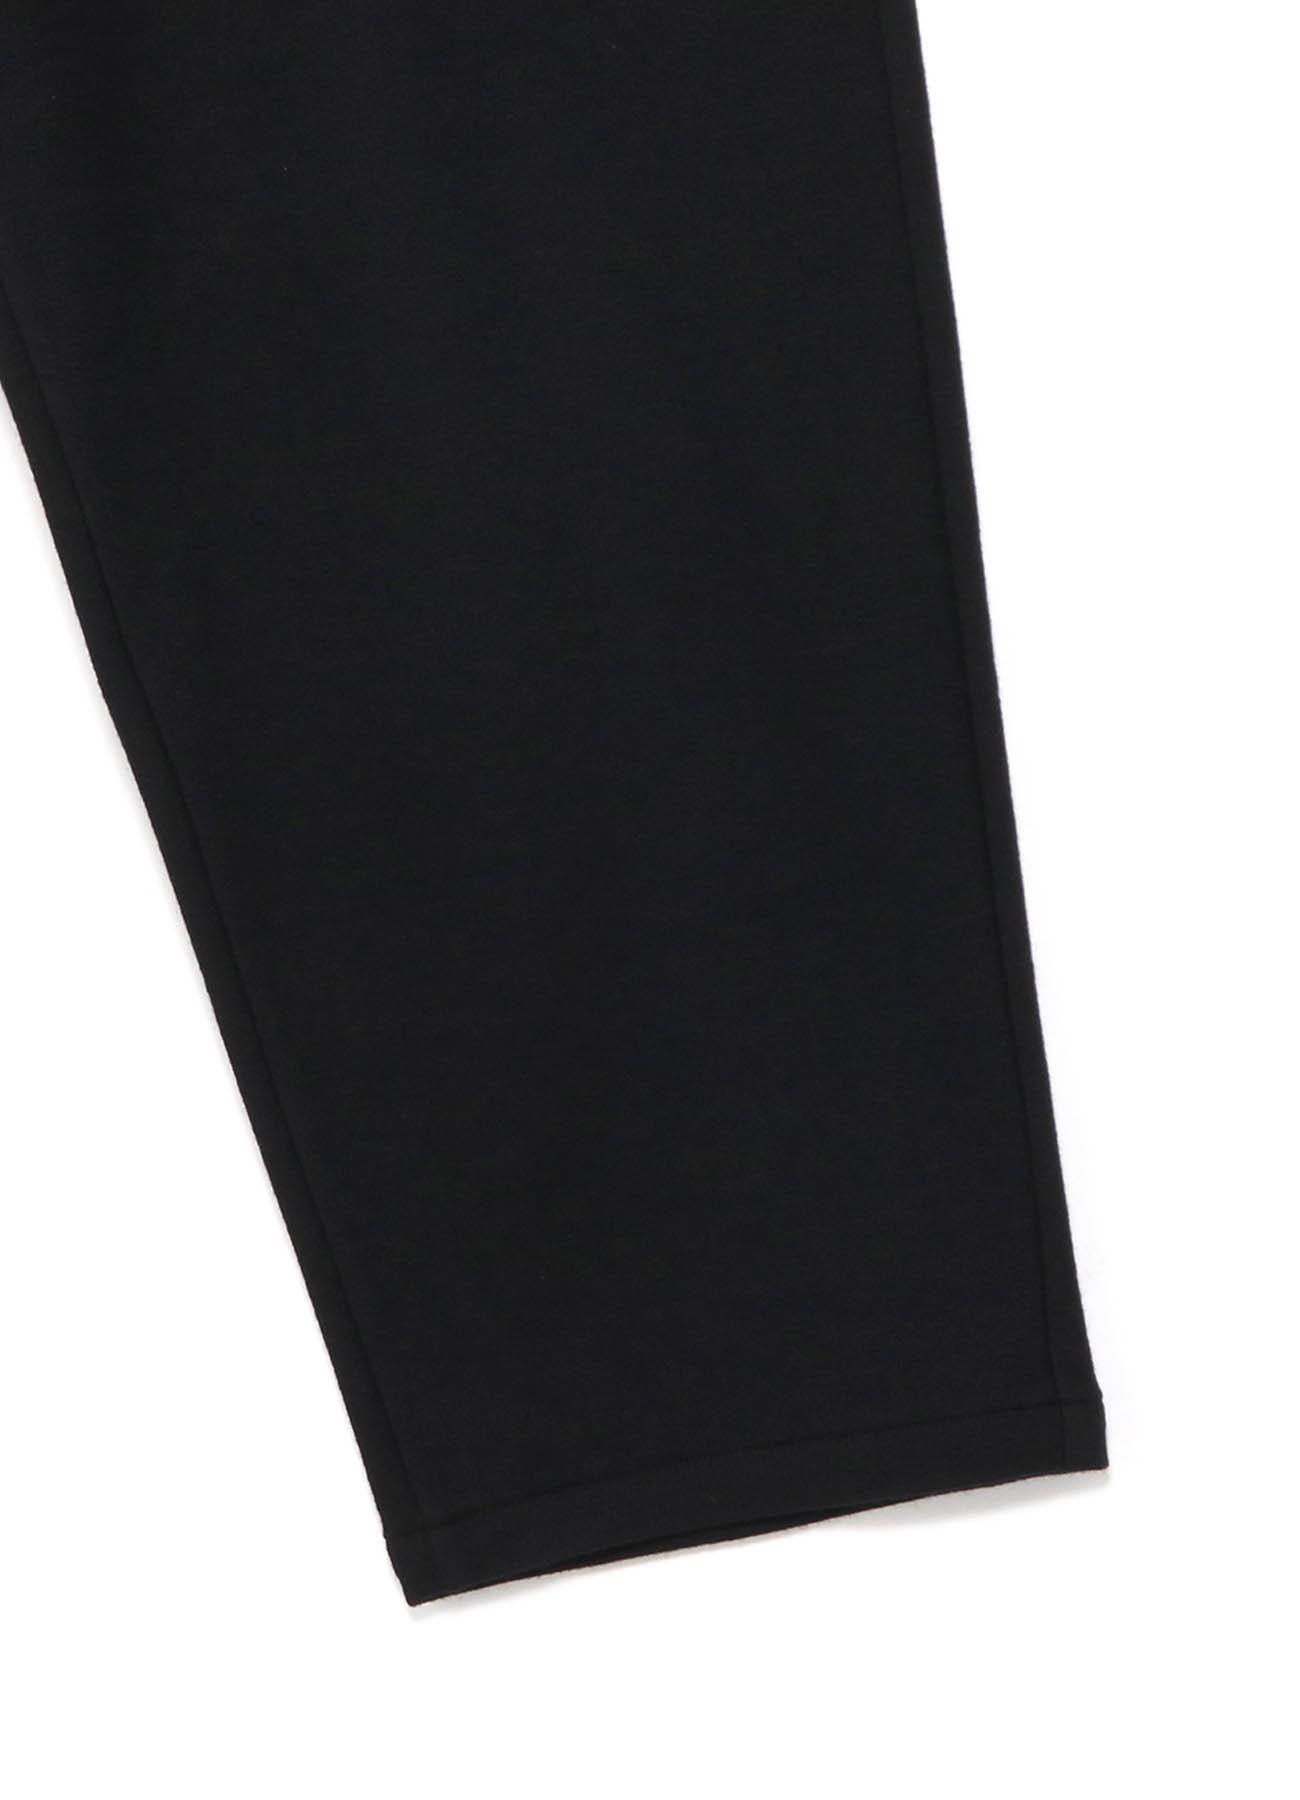 REGULATION 1/60 COMPRESSED SMOOTH PANTS